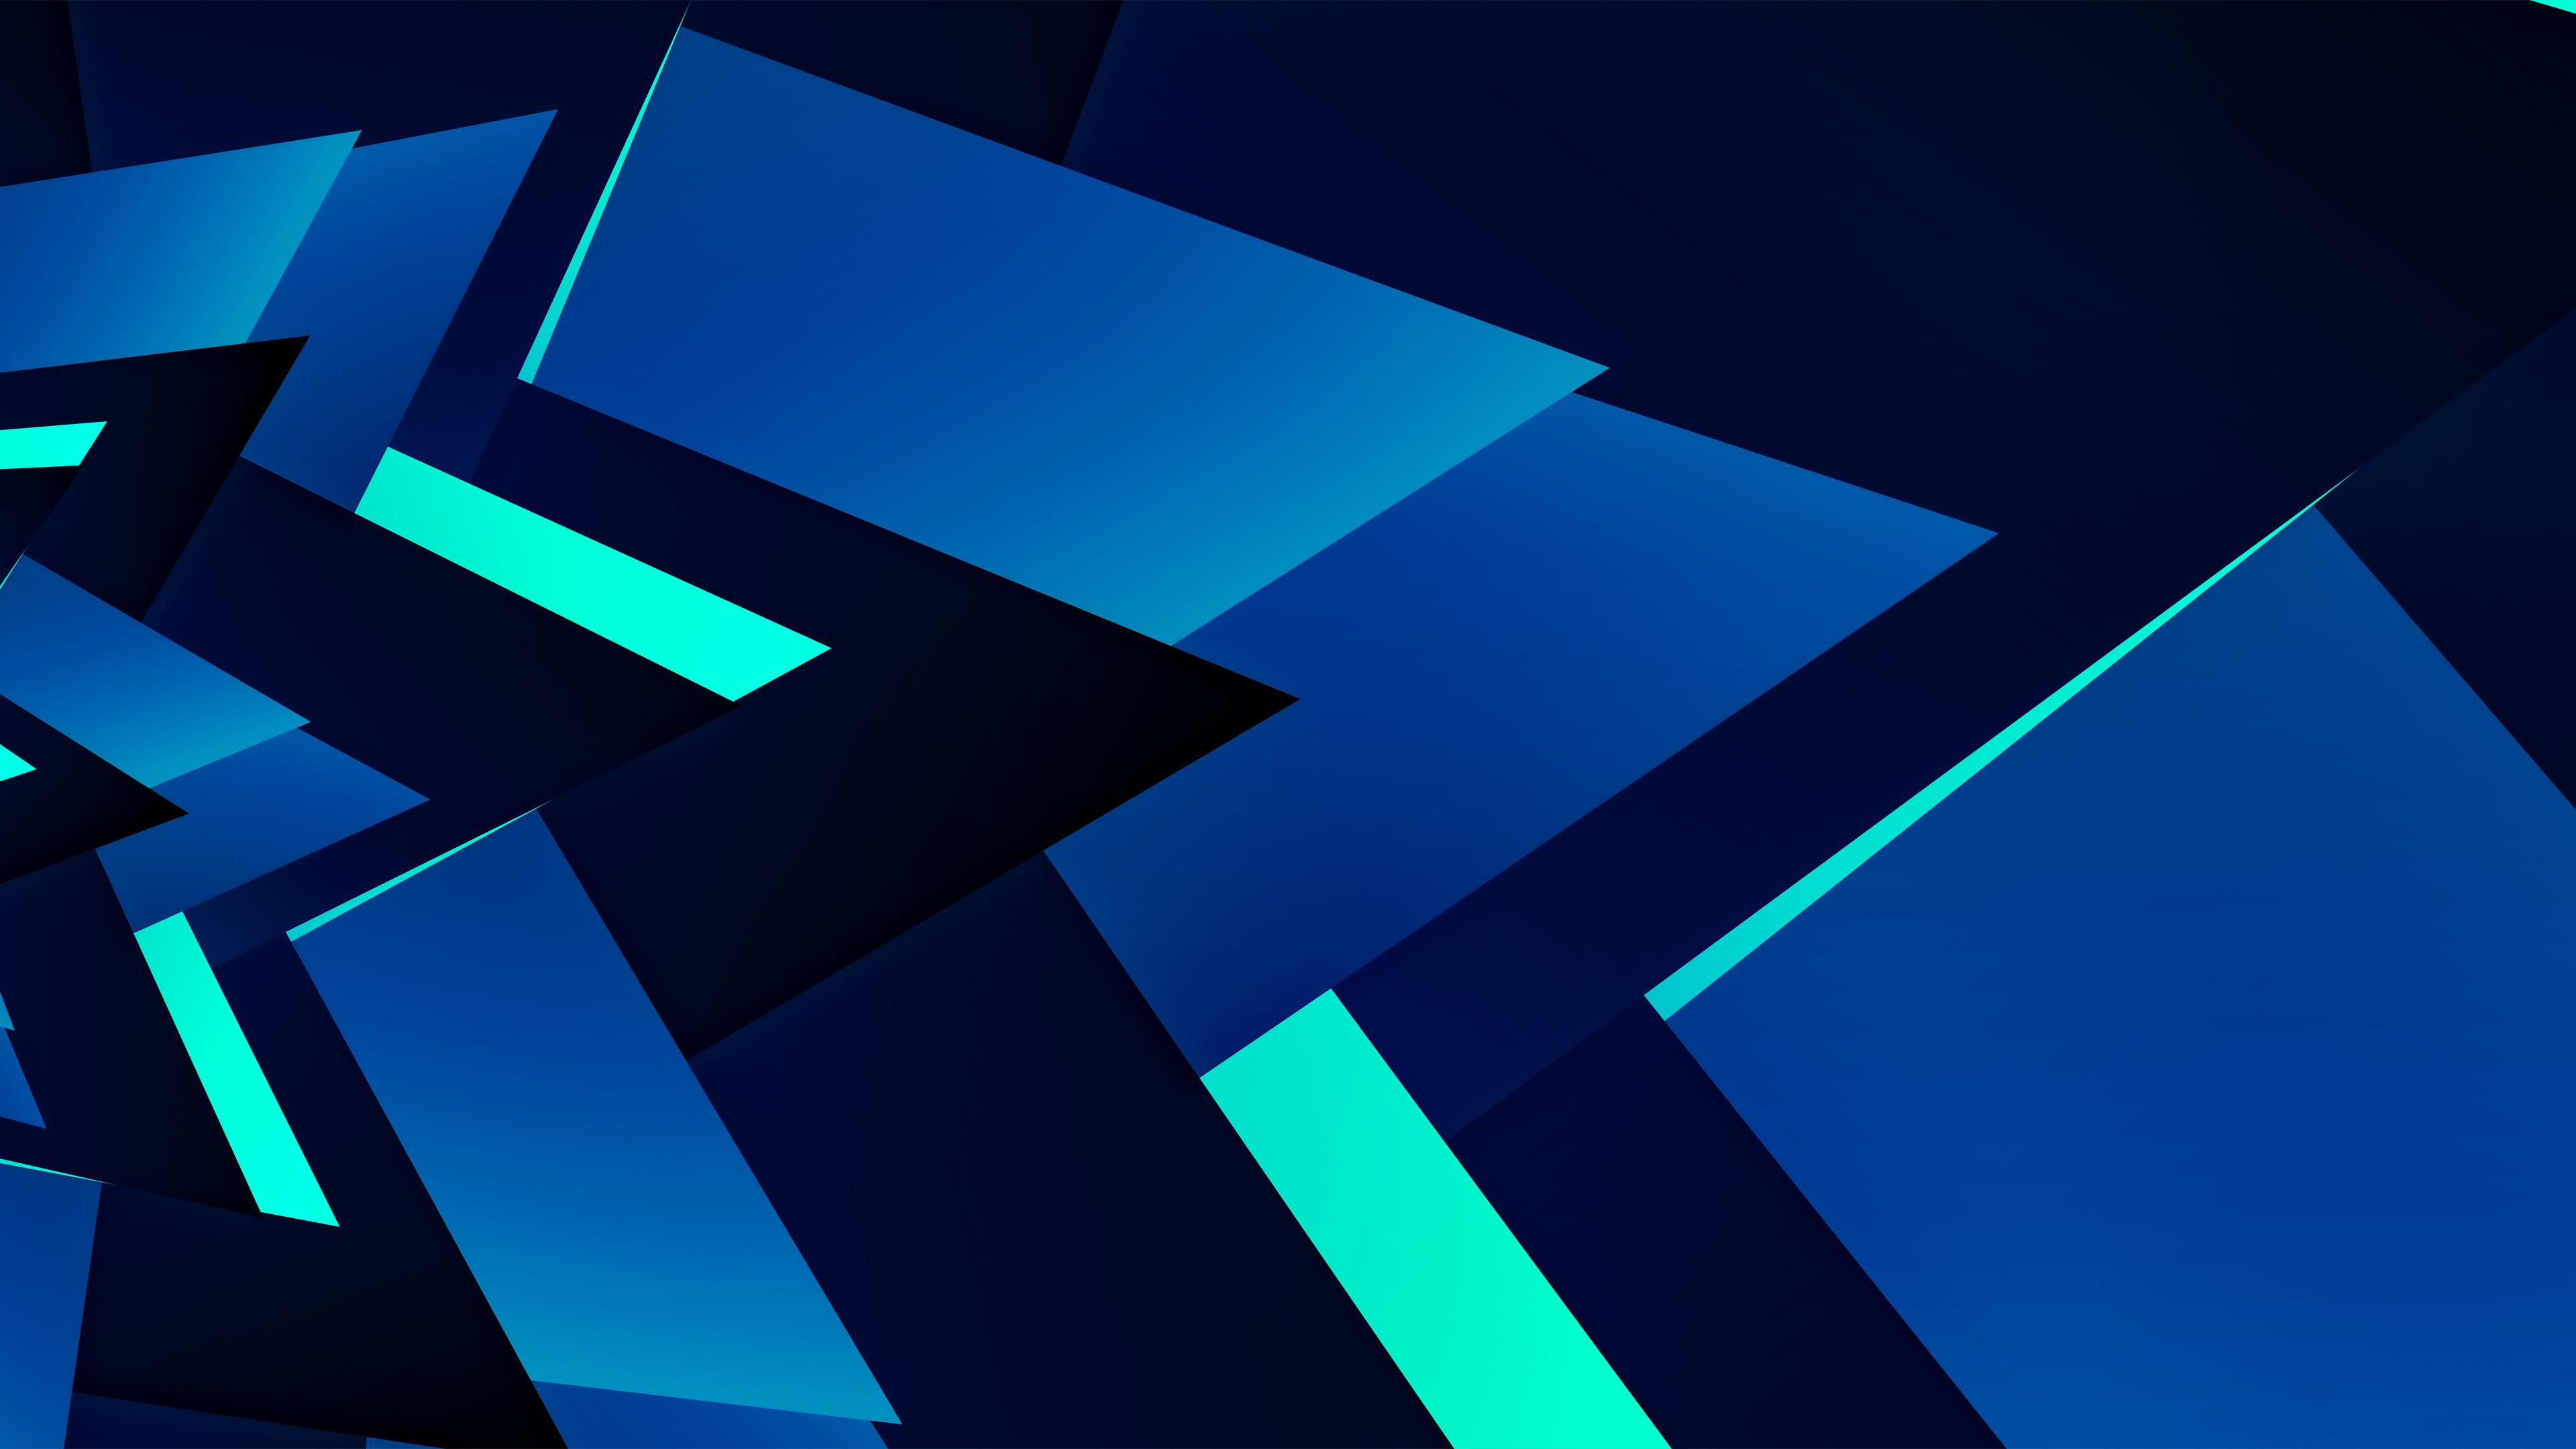 abstract genine color 1575660297 - Abstract Genine Color -